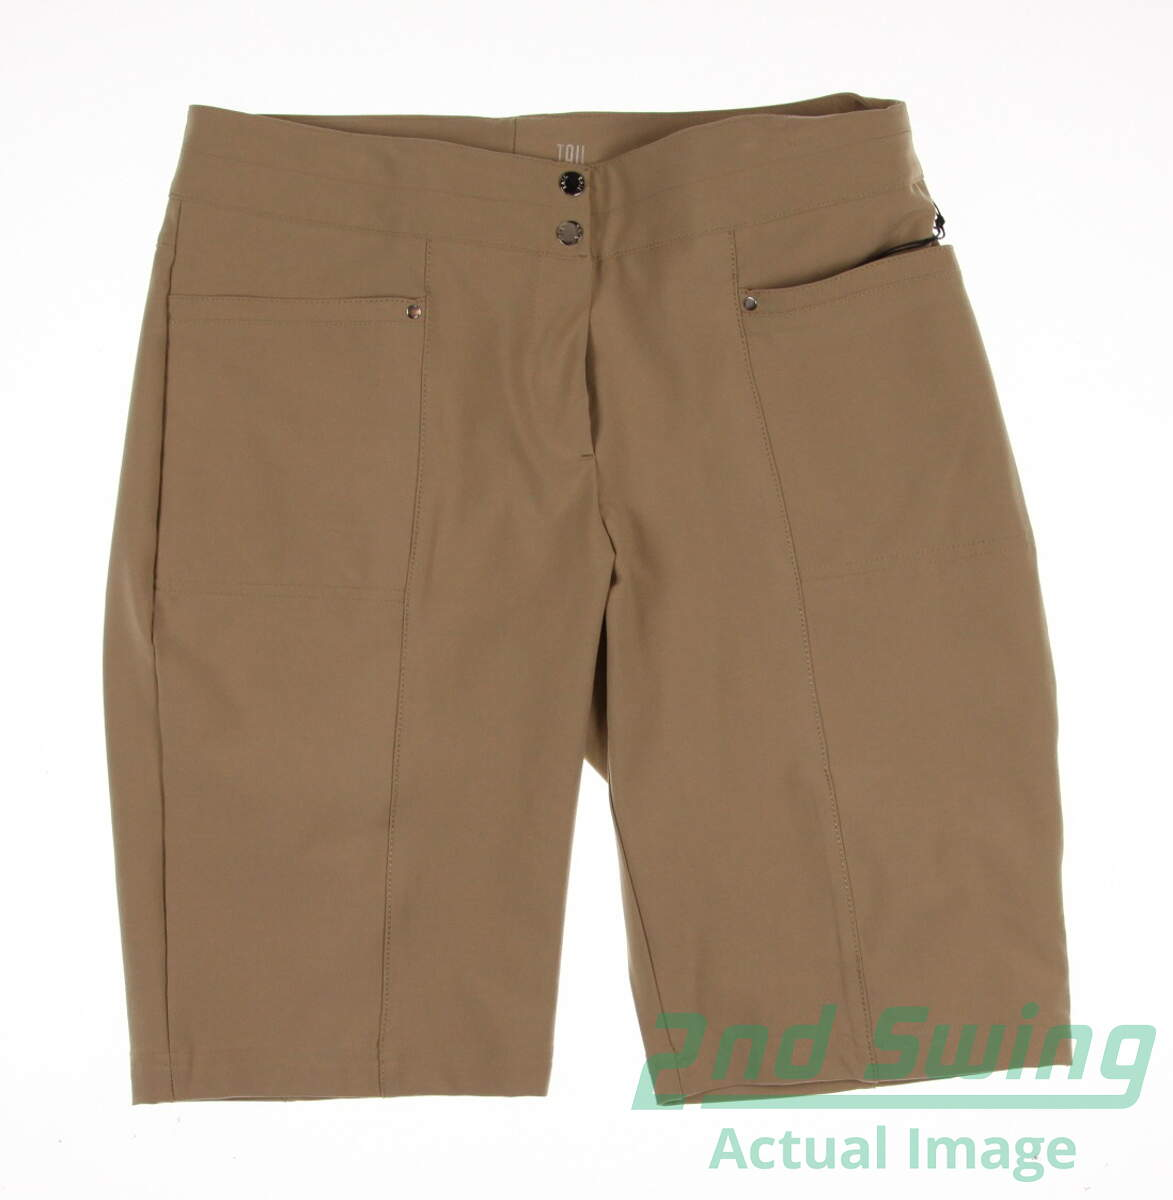 New Womens Tail Golf Shorts Size 8 Khaki Msrp 89 2nd